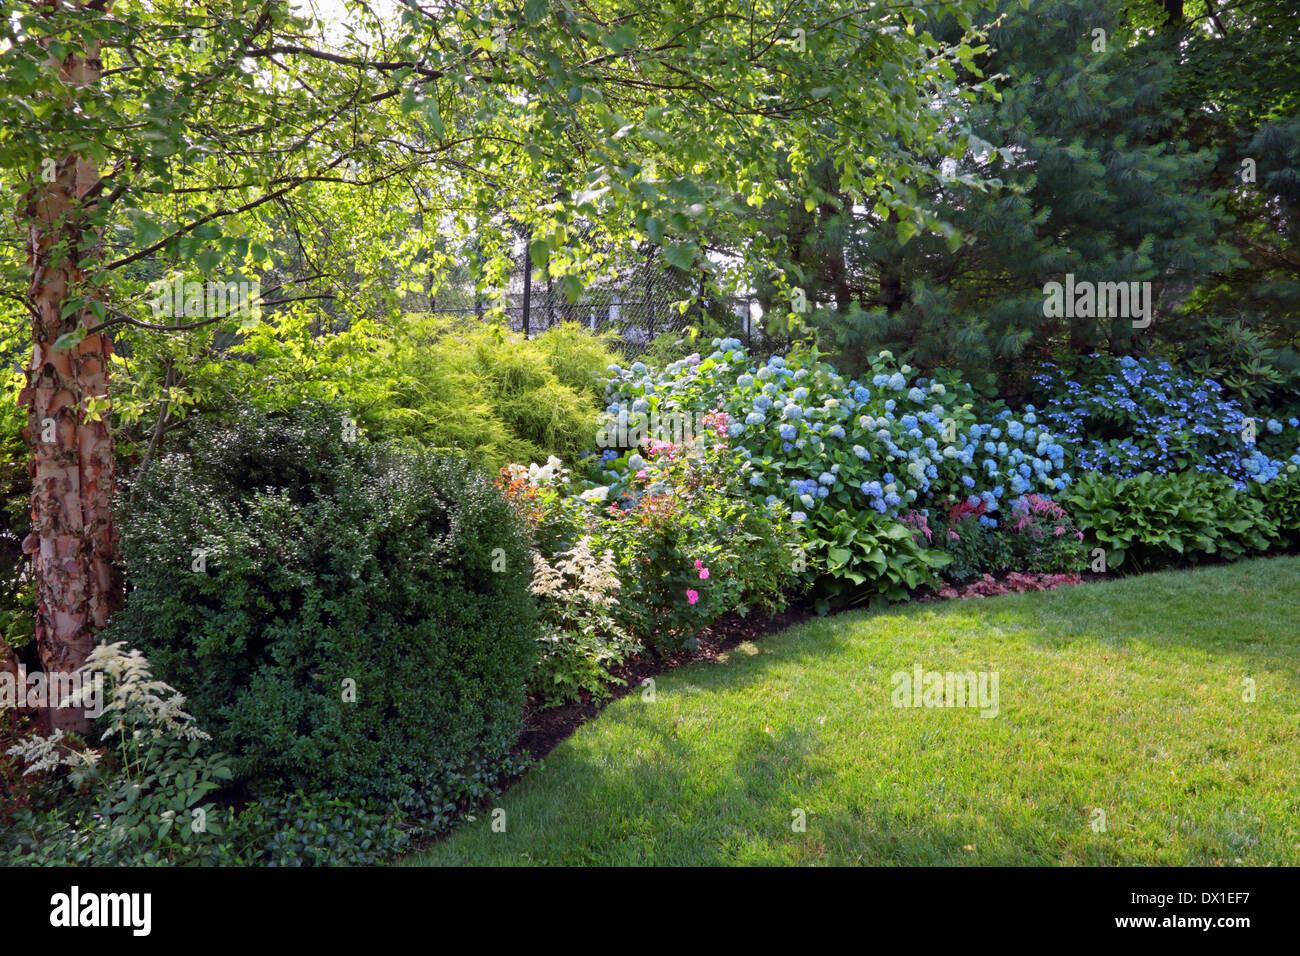 Gardens In Westchester County, Westchester County, United States.  Architect: Catherine Wachs, 2013. Garden Details.